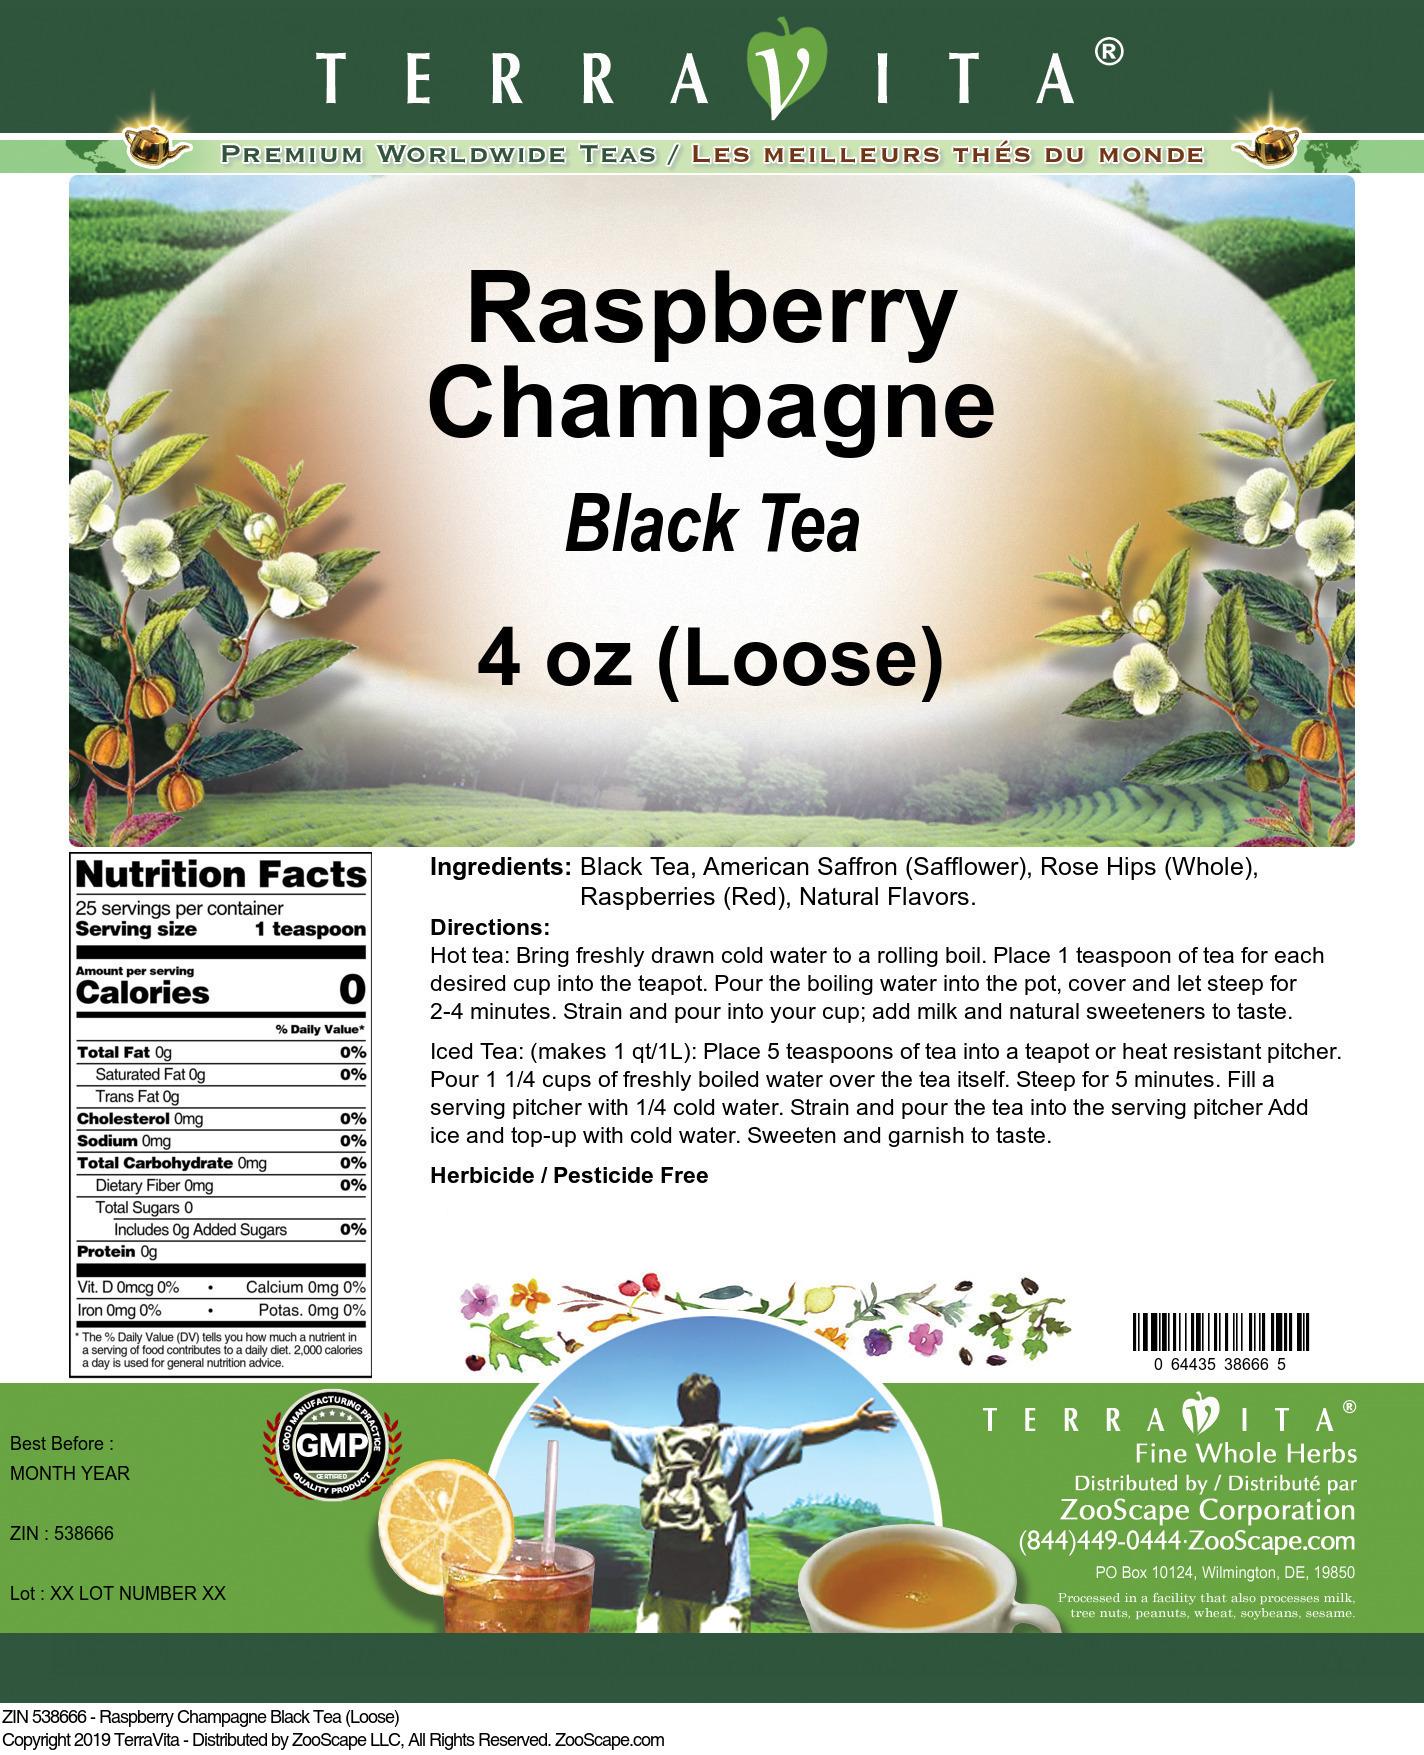 Raspberry Champagne Black Tea (Loose)